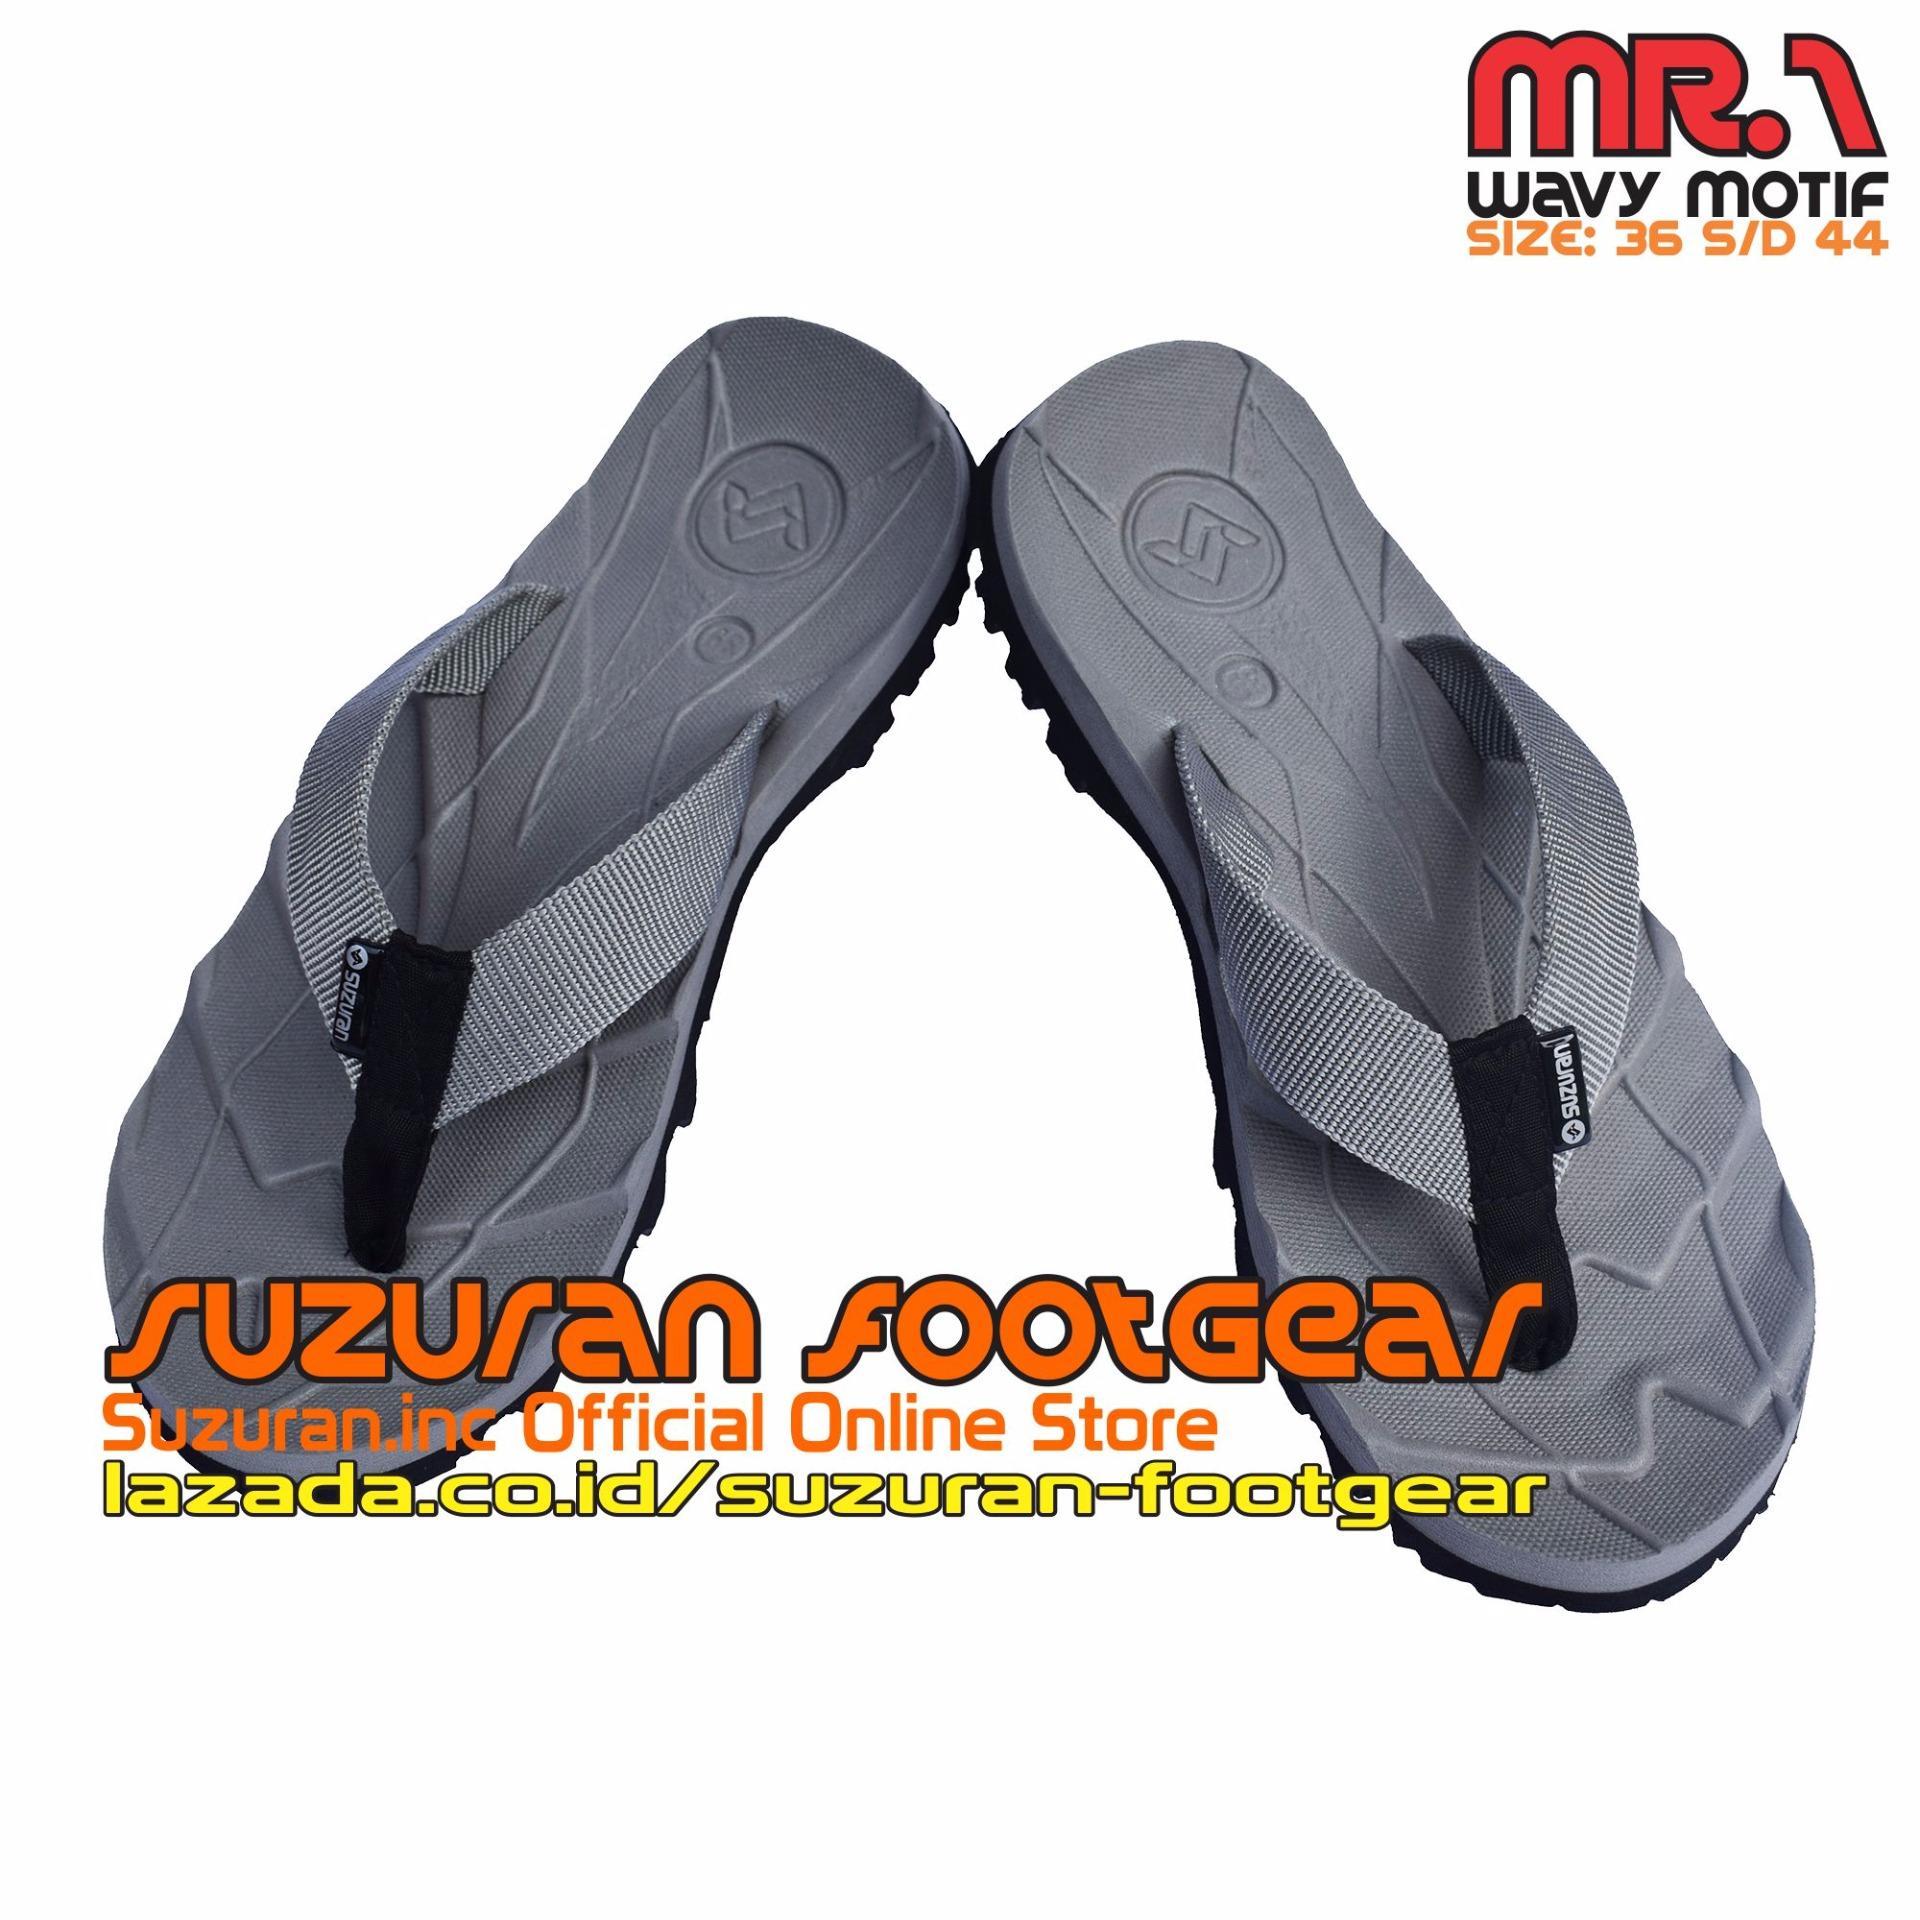 Spesifikasi Suzuran Sandal Gunung Flip Flop Mr1 Grey Lengkap